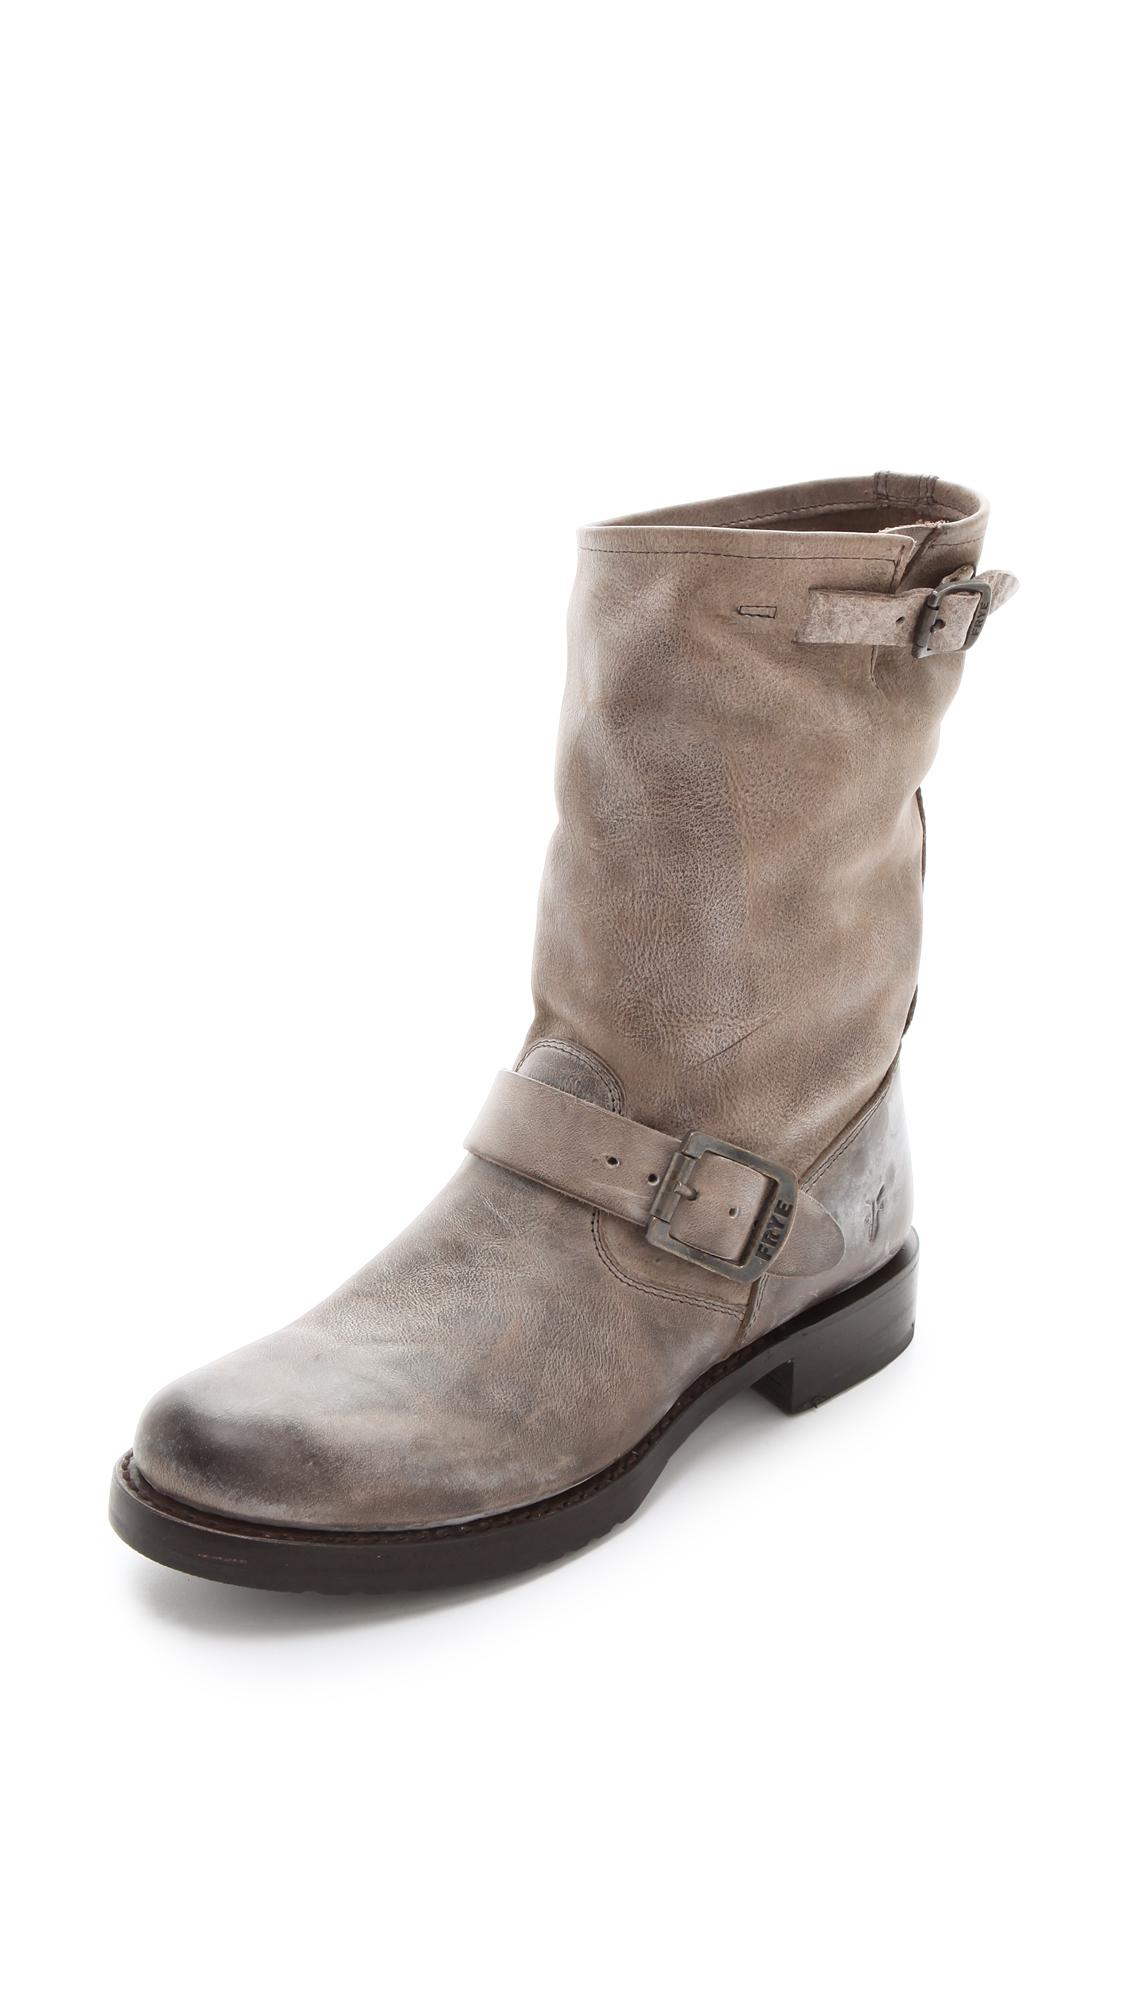 Frye Veronica Short Boots Black In Gray Lyst